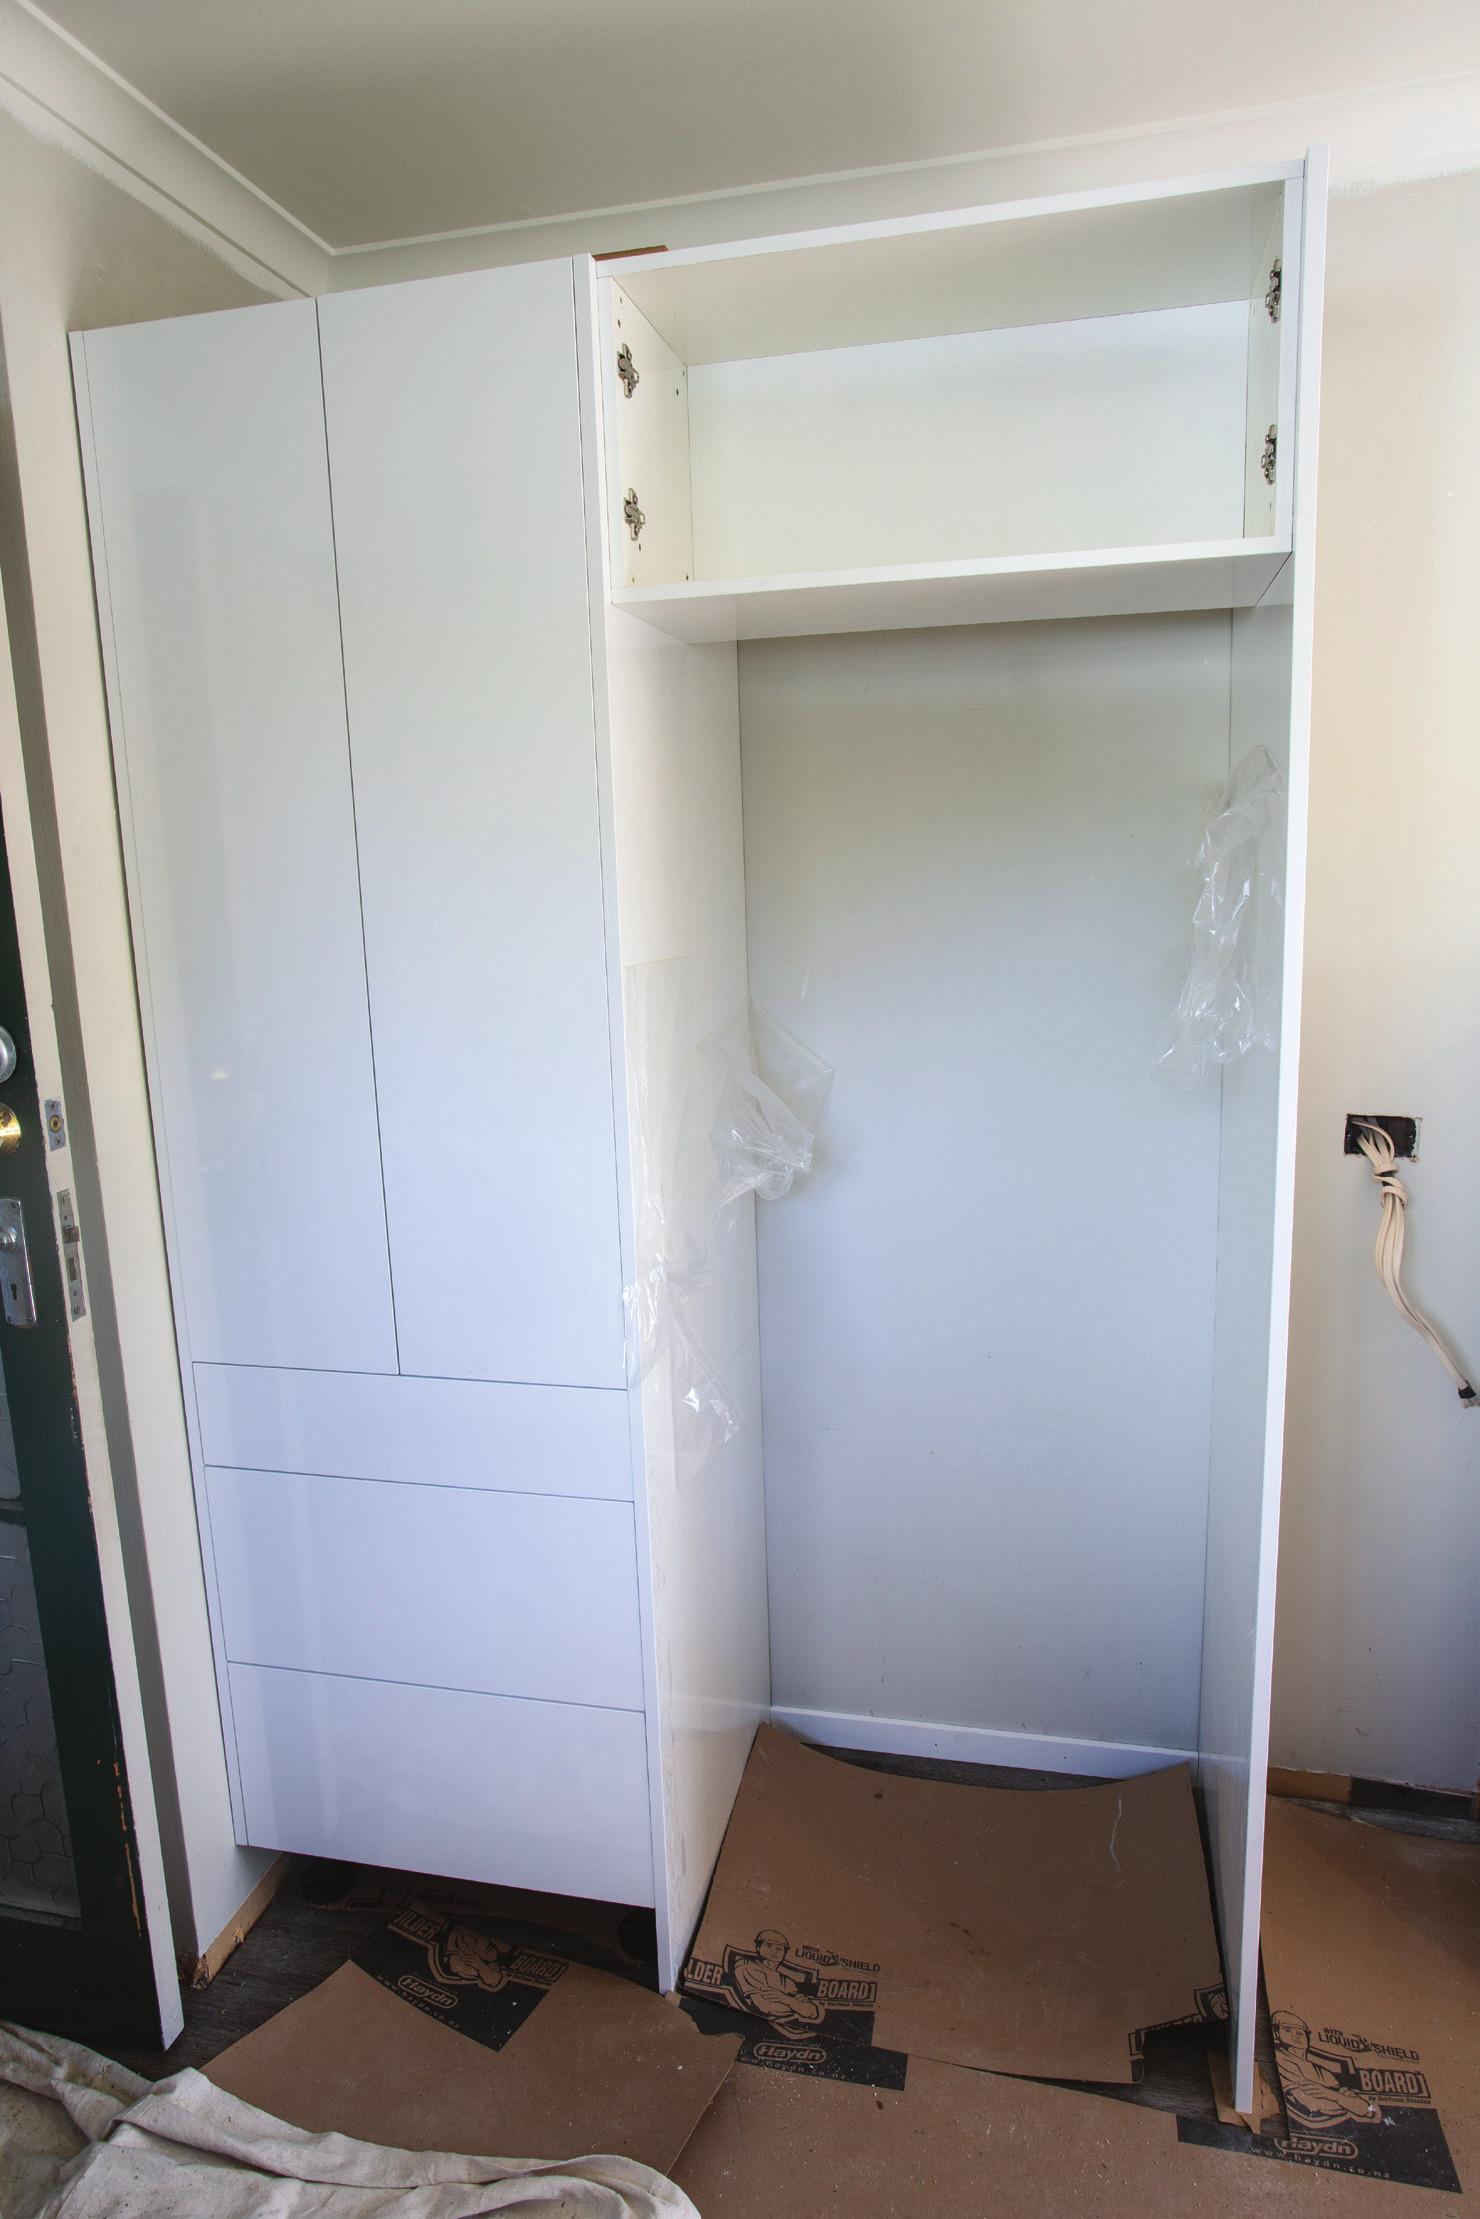 Shed_079_20180611_Installing-a-Kitchen-009.jpg